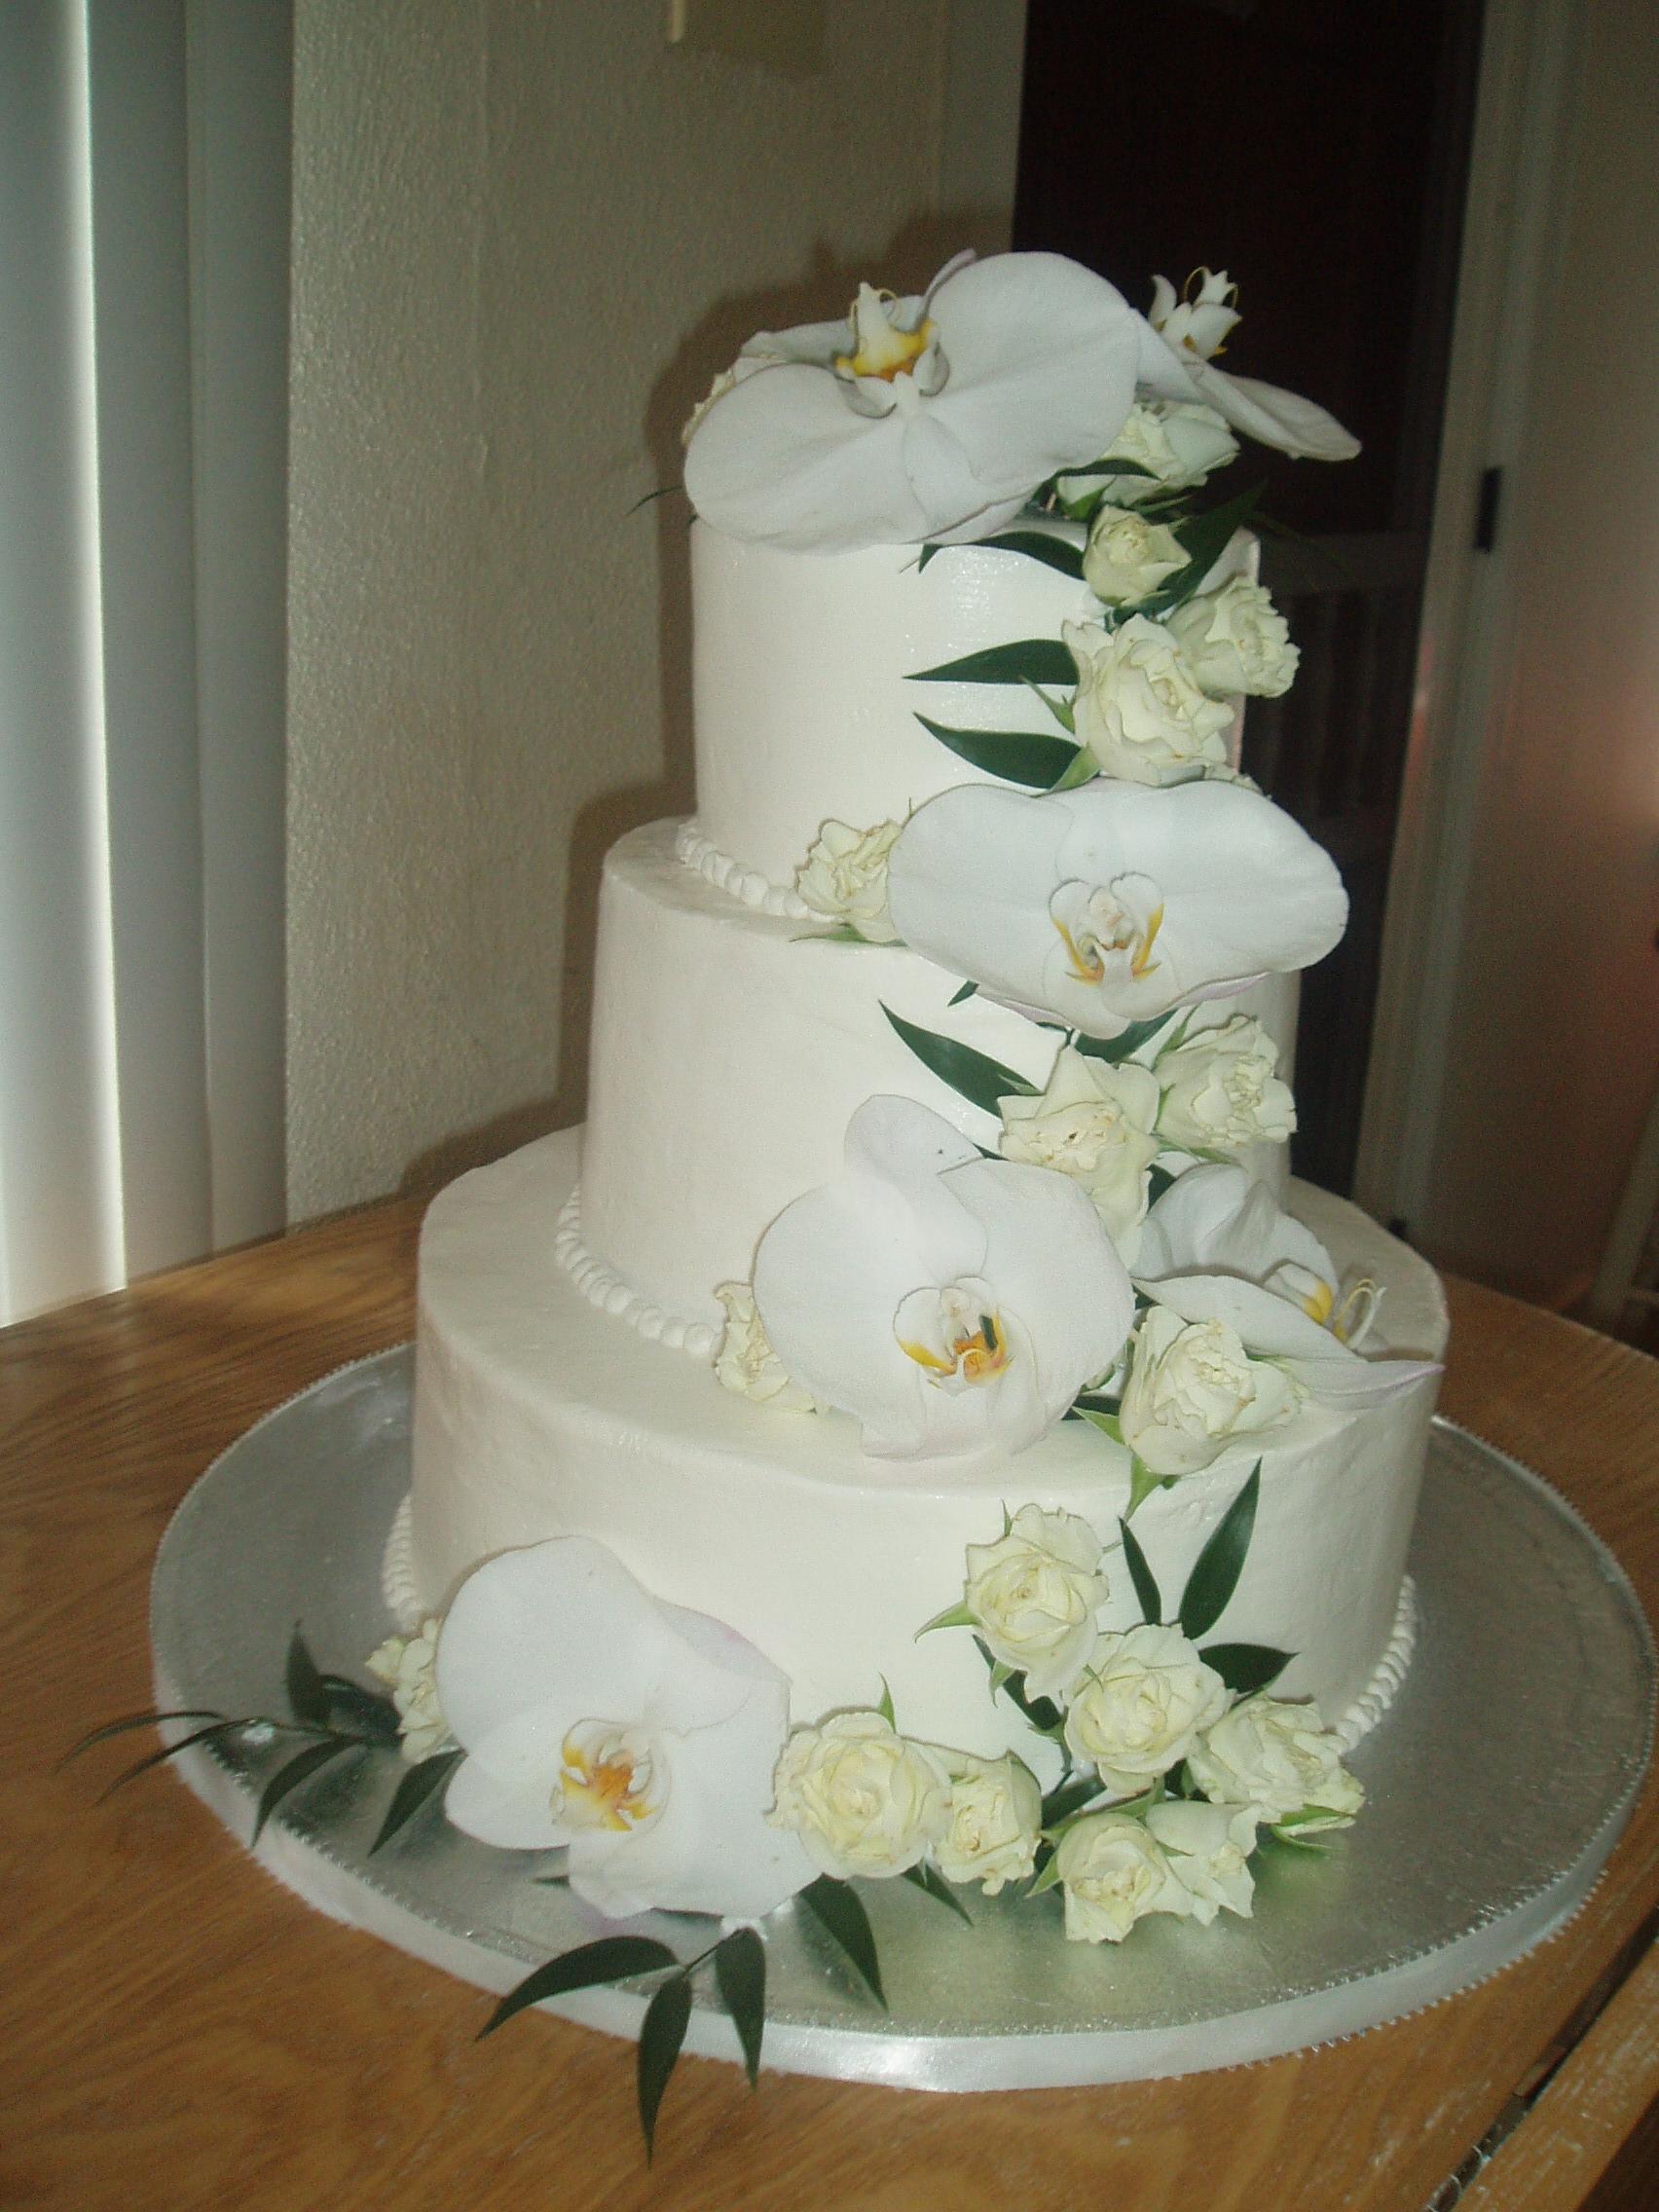 Cakes 002.JPG